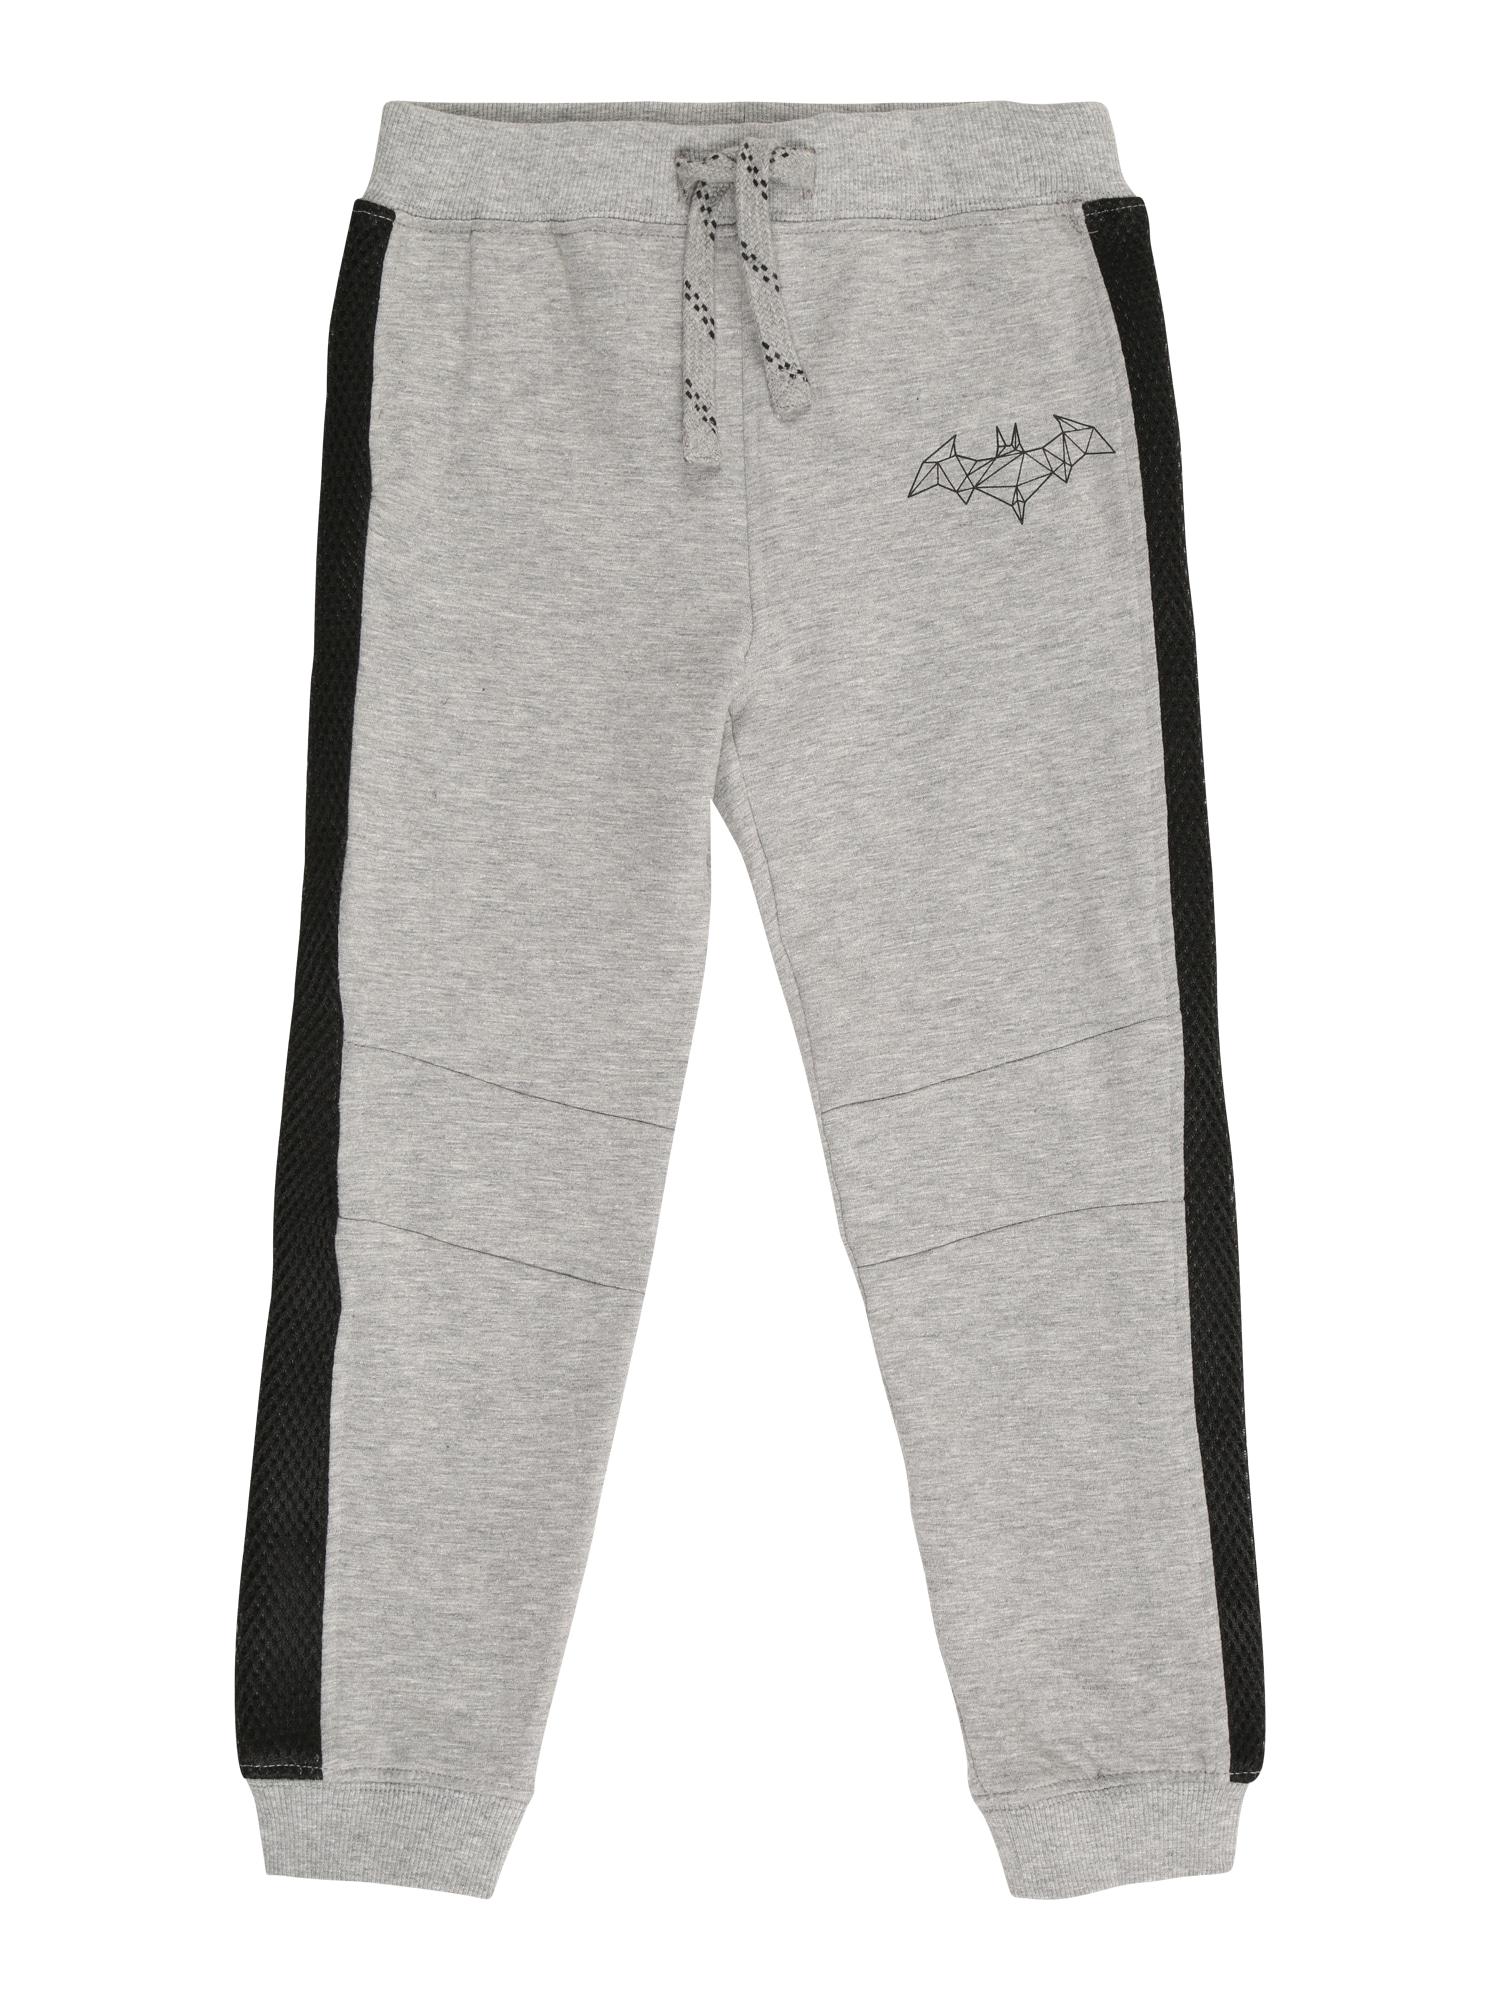 NAME IT Kalhoty 'BATMAN TOBY'  šedý melír